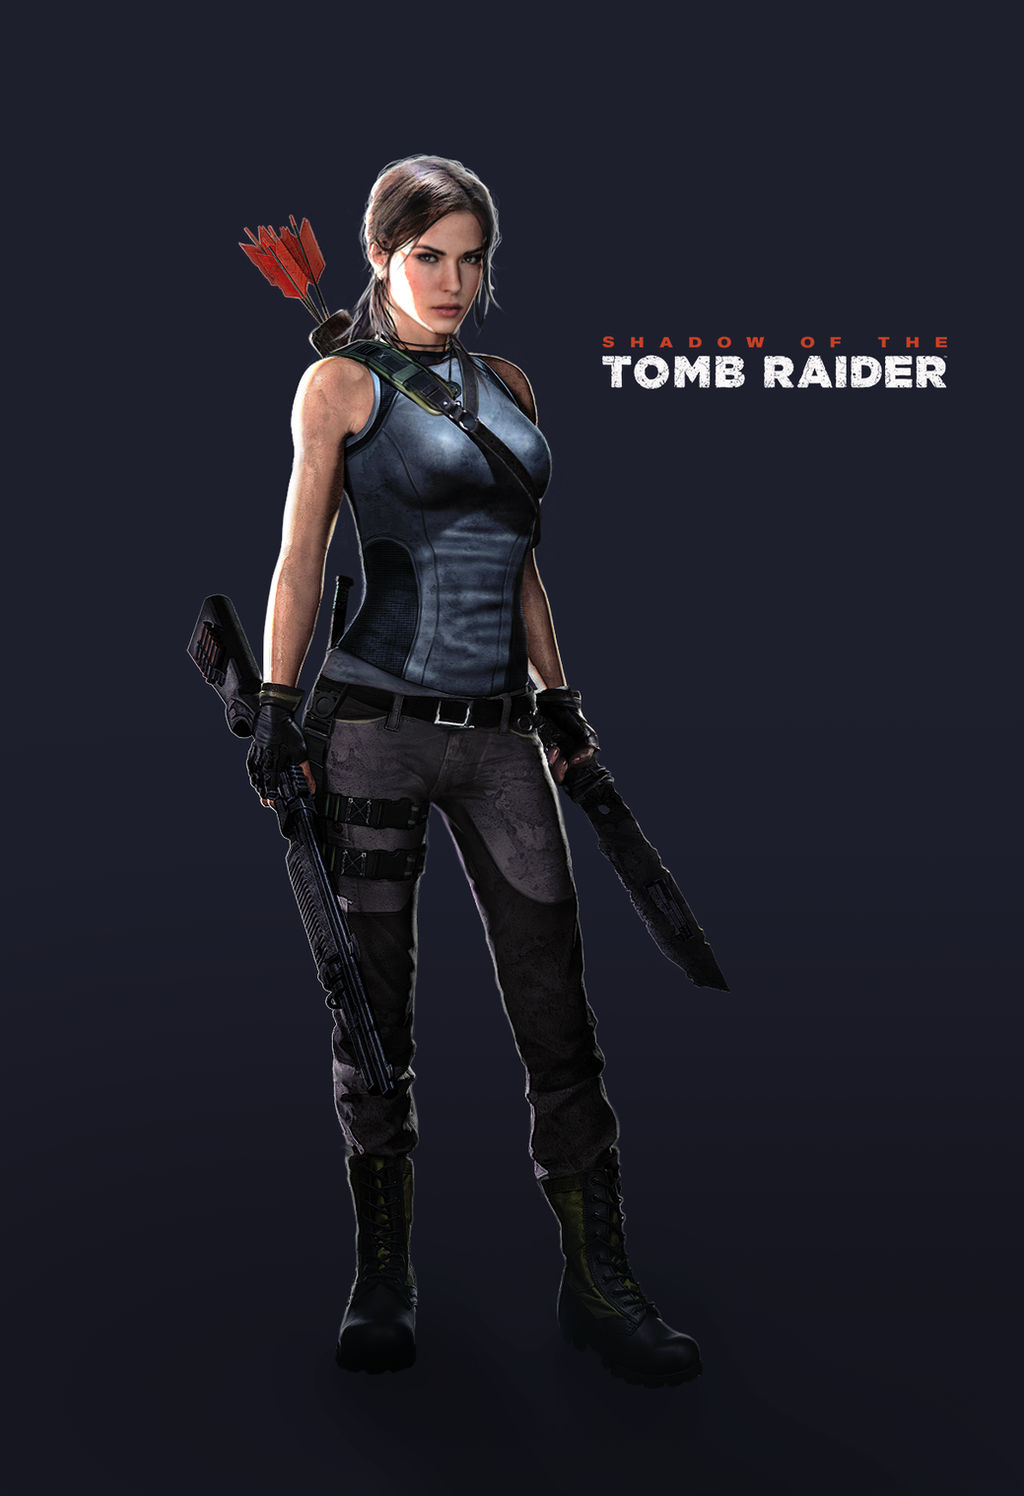 Shadow of the Tomb Raider's Lara Croft